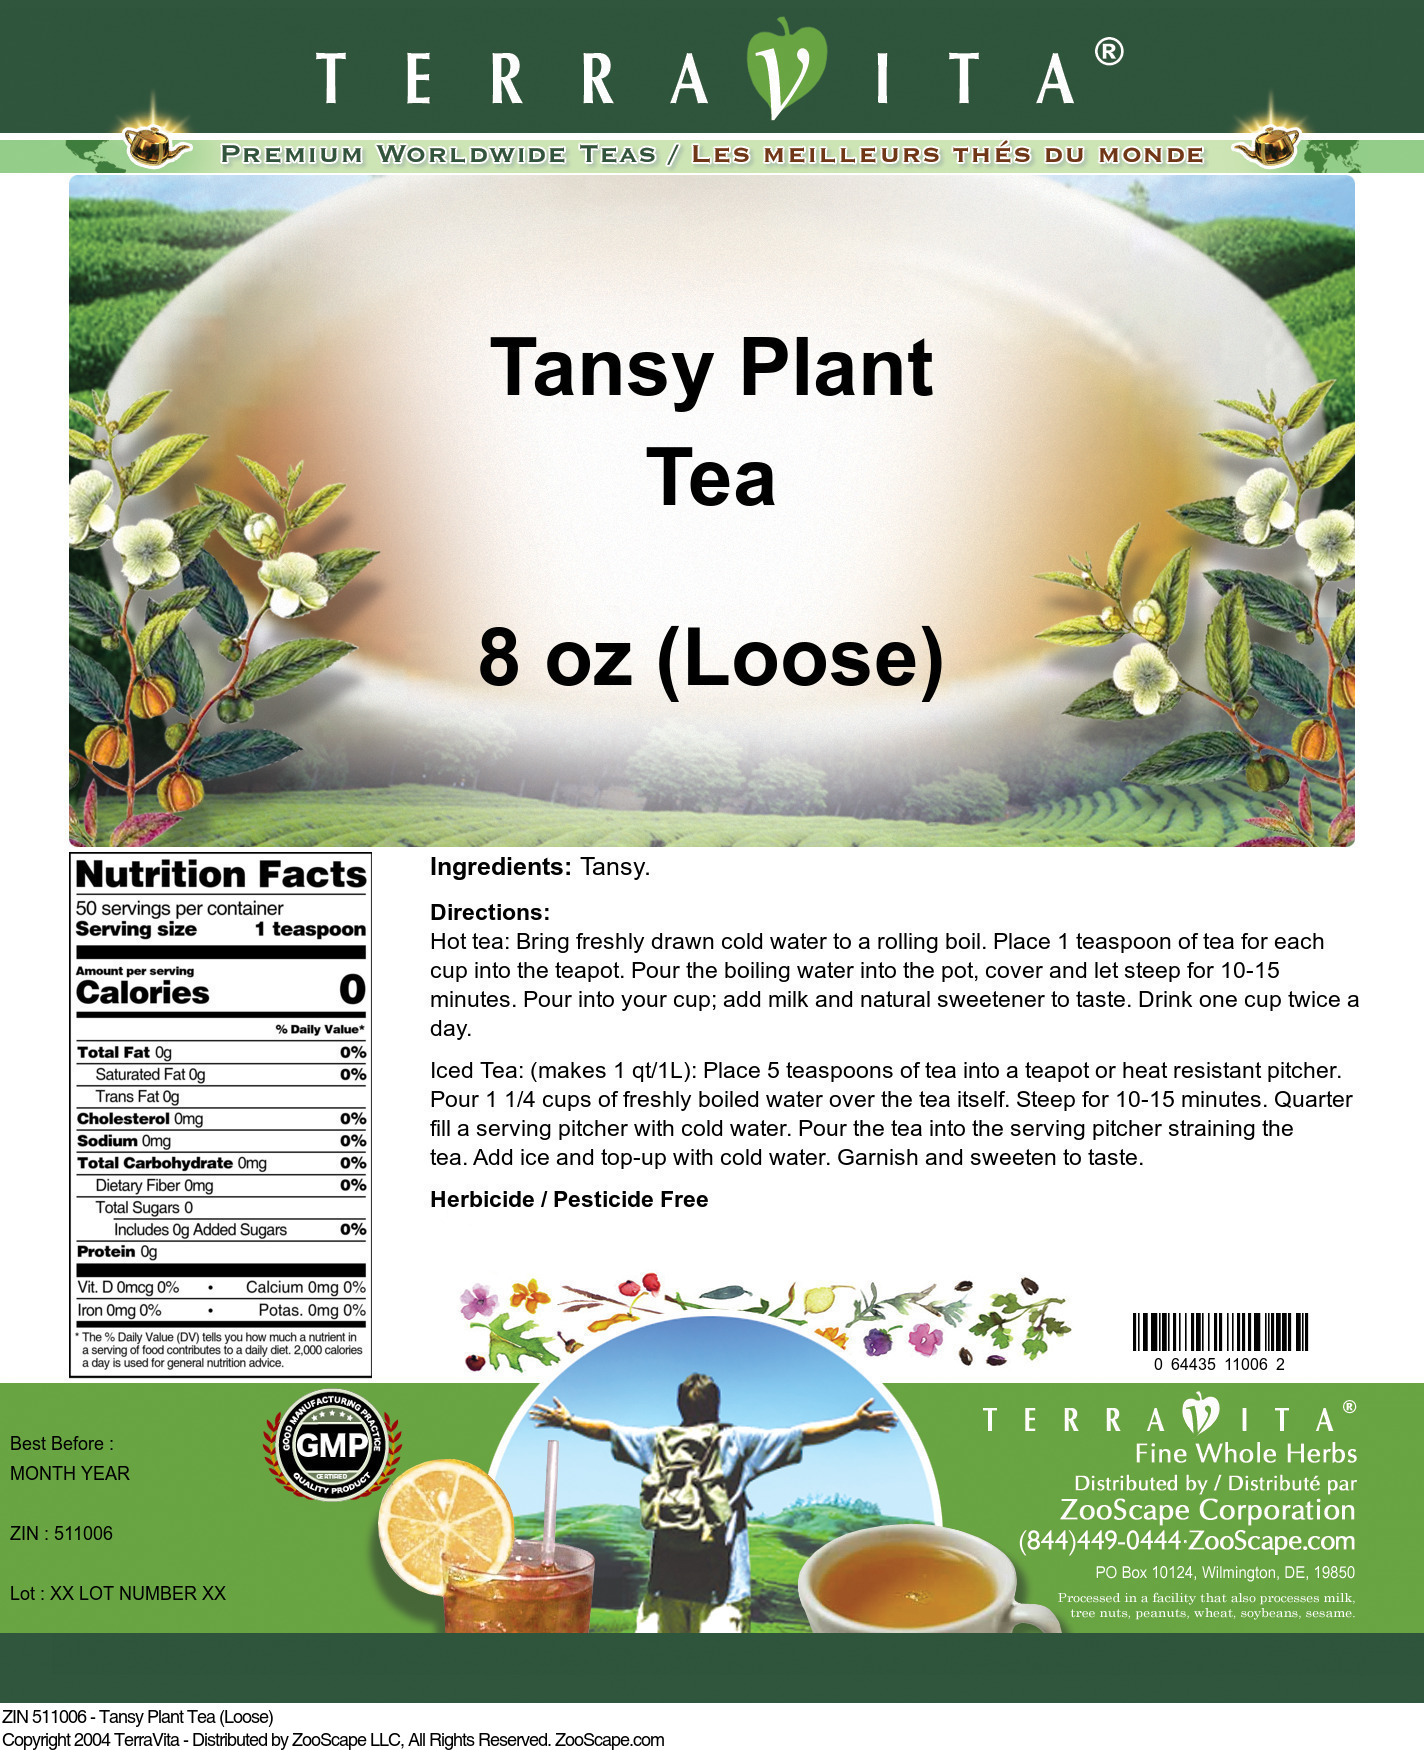 Tansy Plant Tea (Loose)